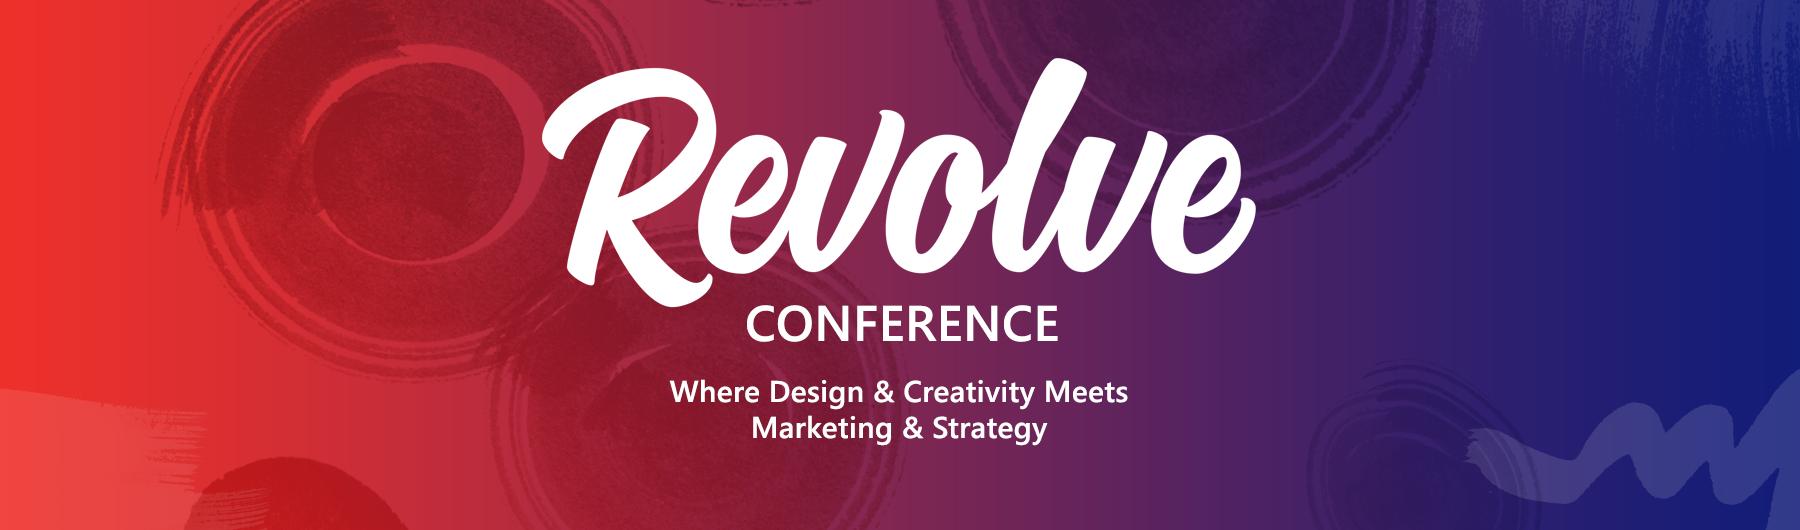 Revolve Conference 2018